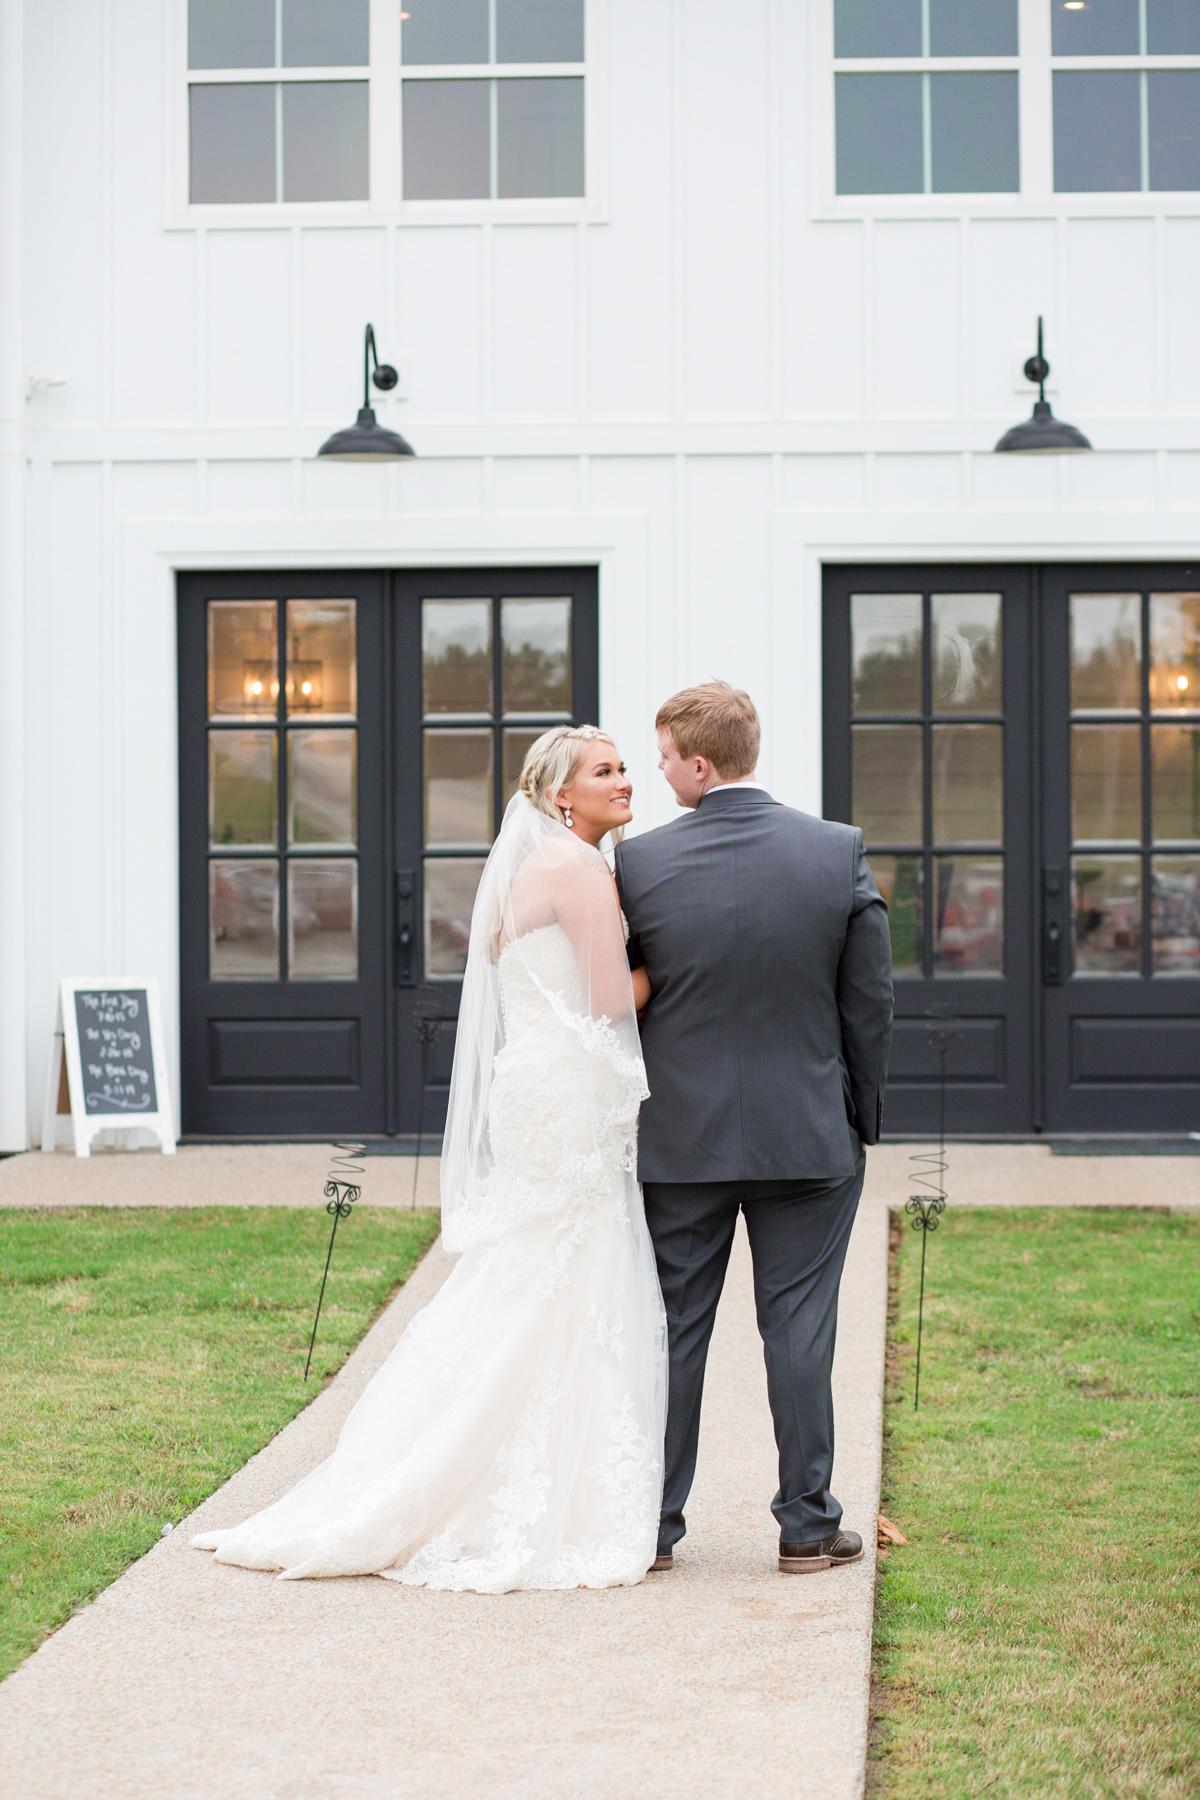 The-venue-at-white-oak-farms-wedding-nashville-wedding-photographers-0272.jpg